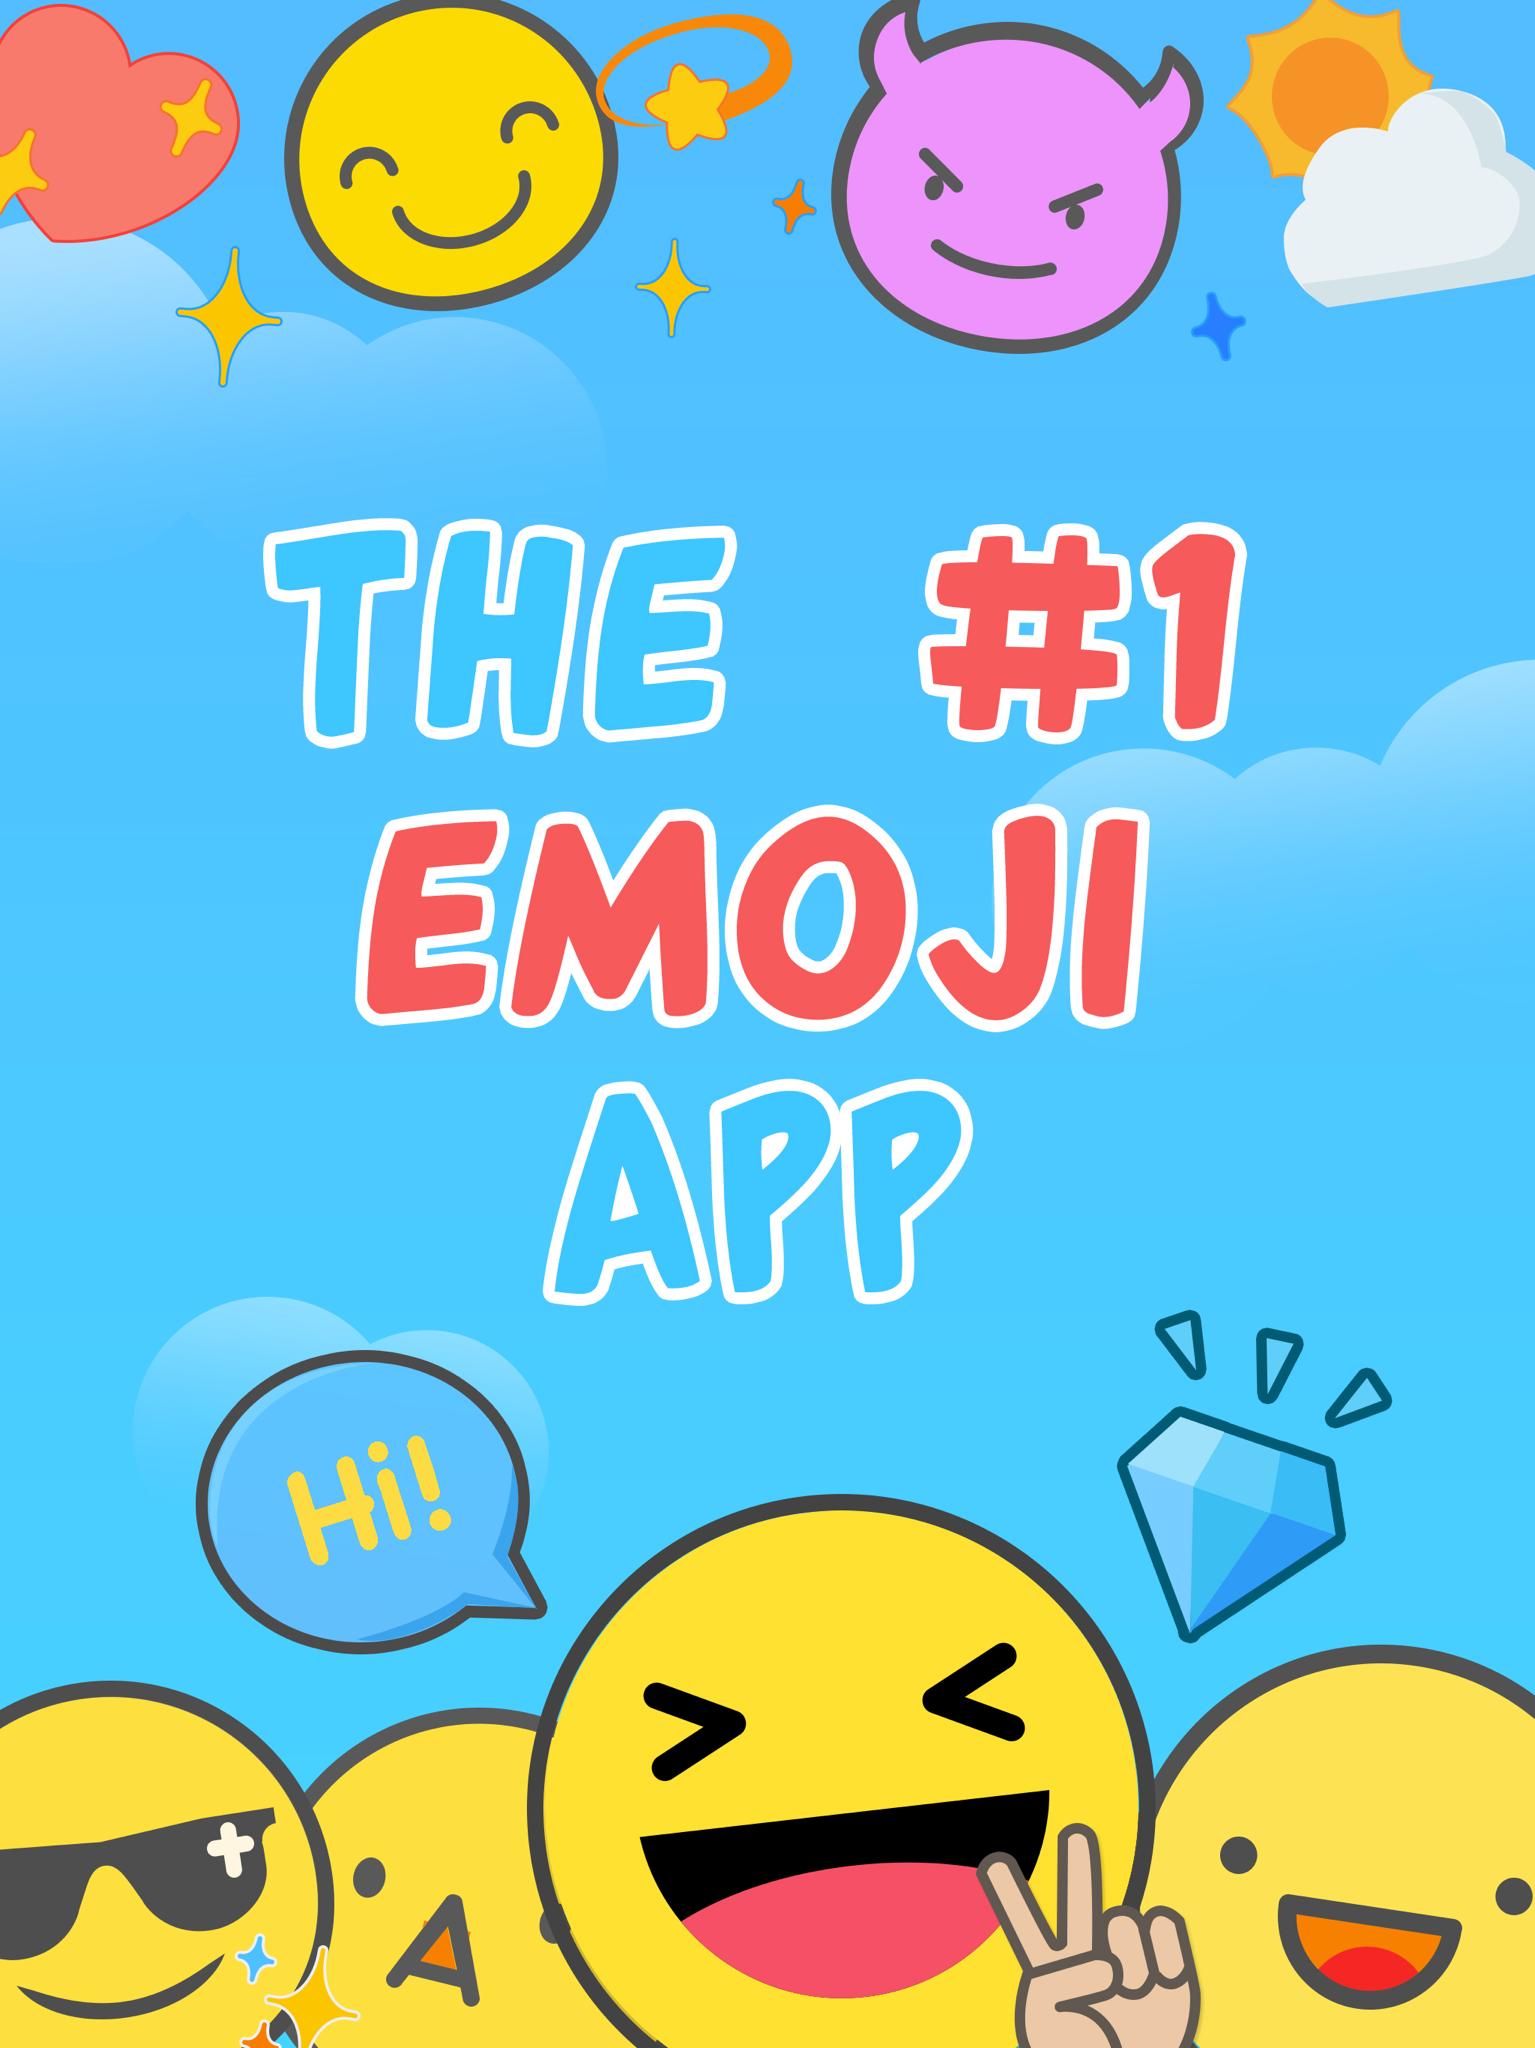 free emoji download for ipad